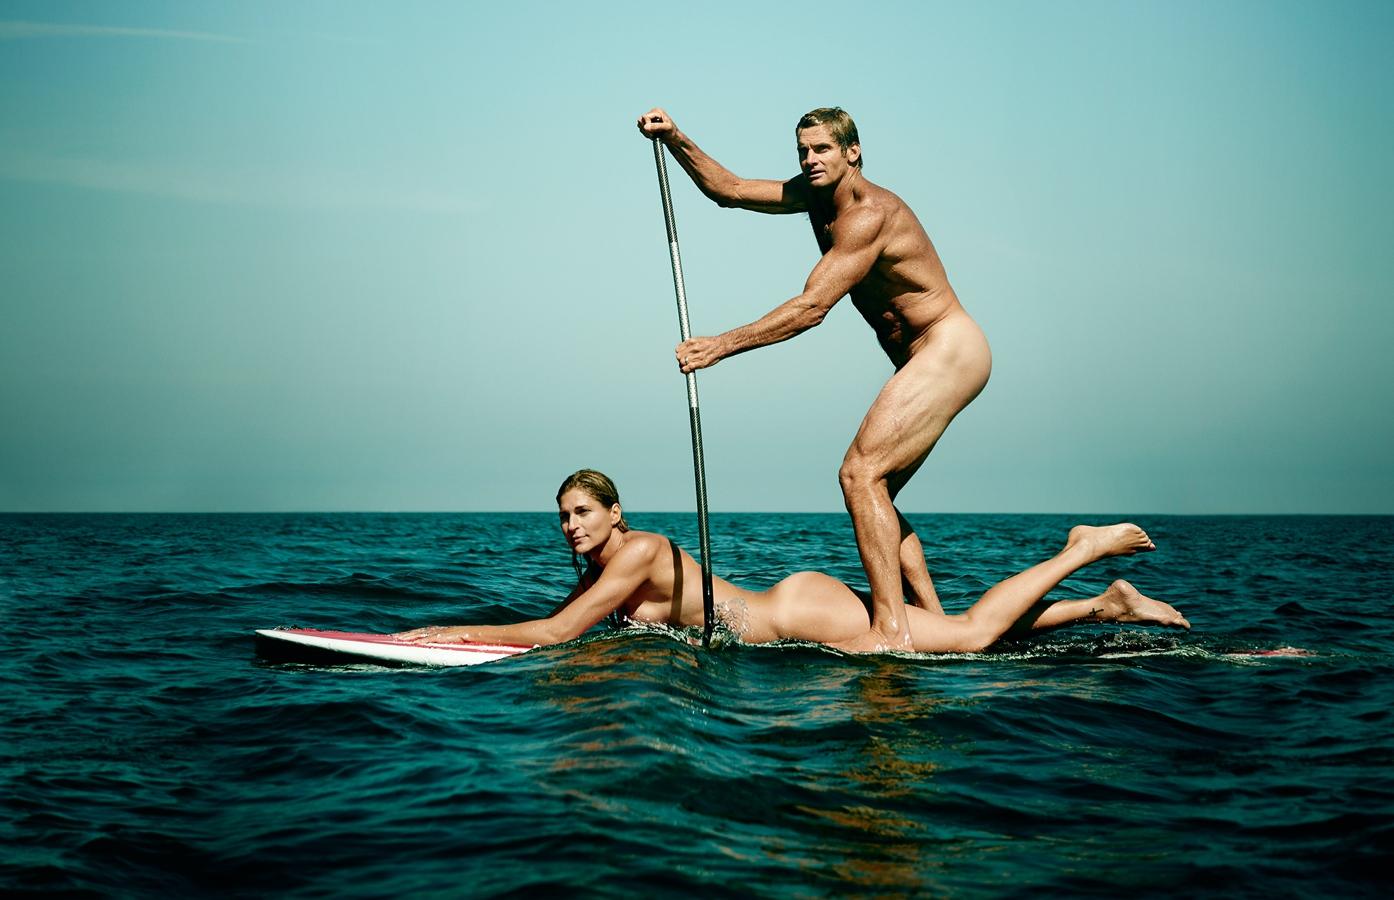 27 - Gabrielle Reece amp Laird Hamilton - Beach Volleyball amp Surfer.jpg